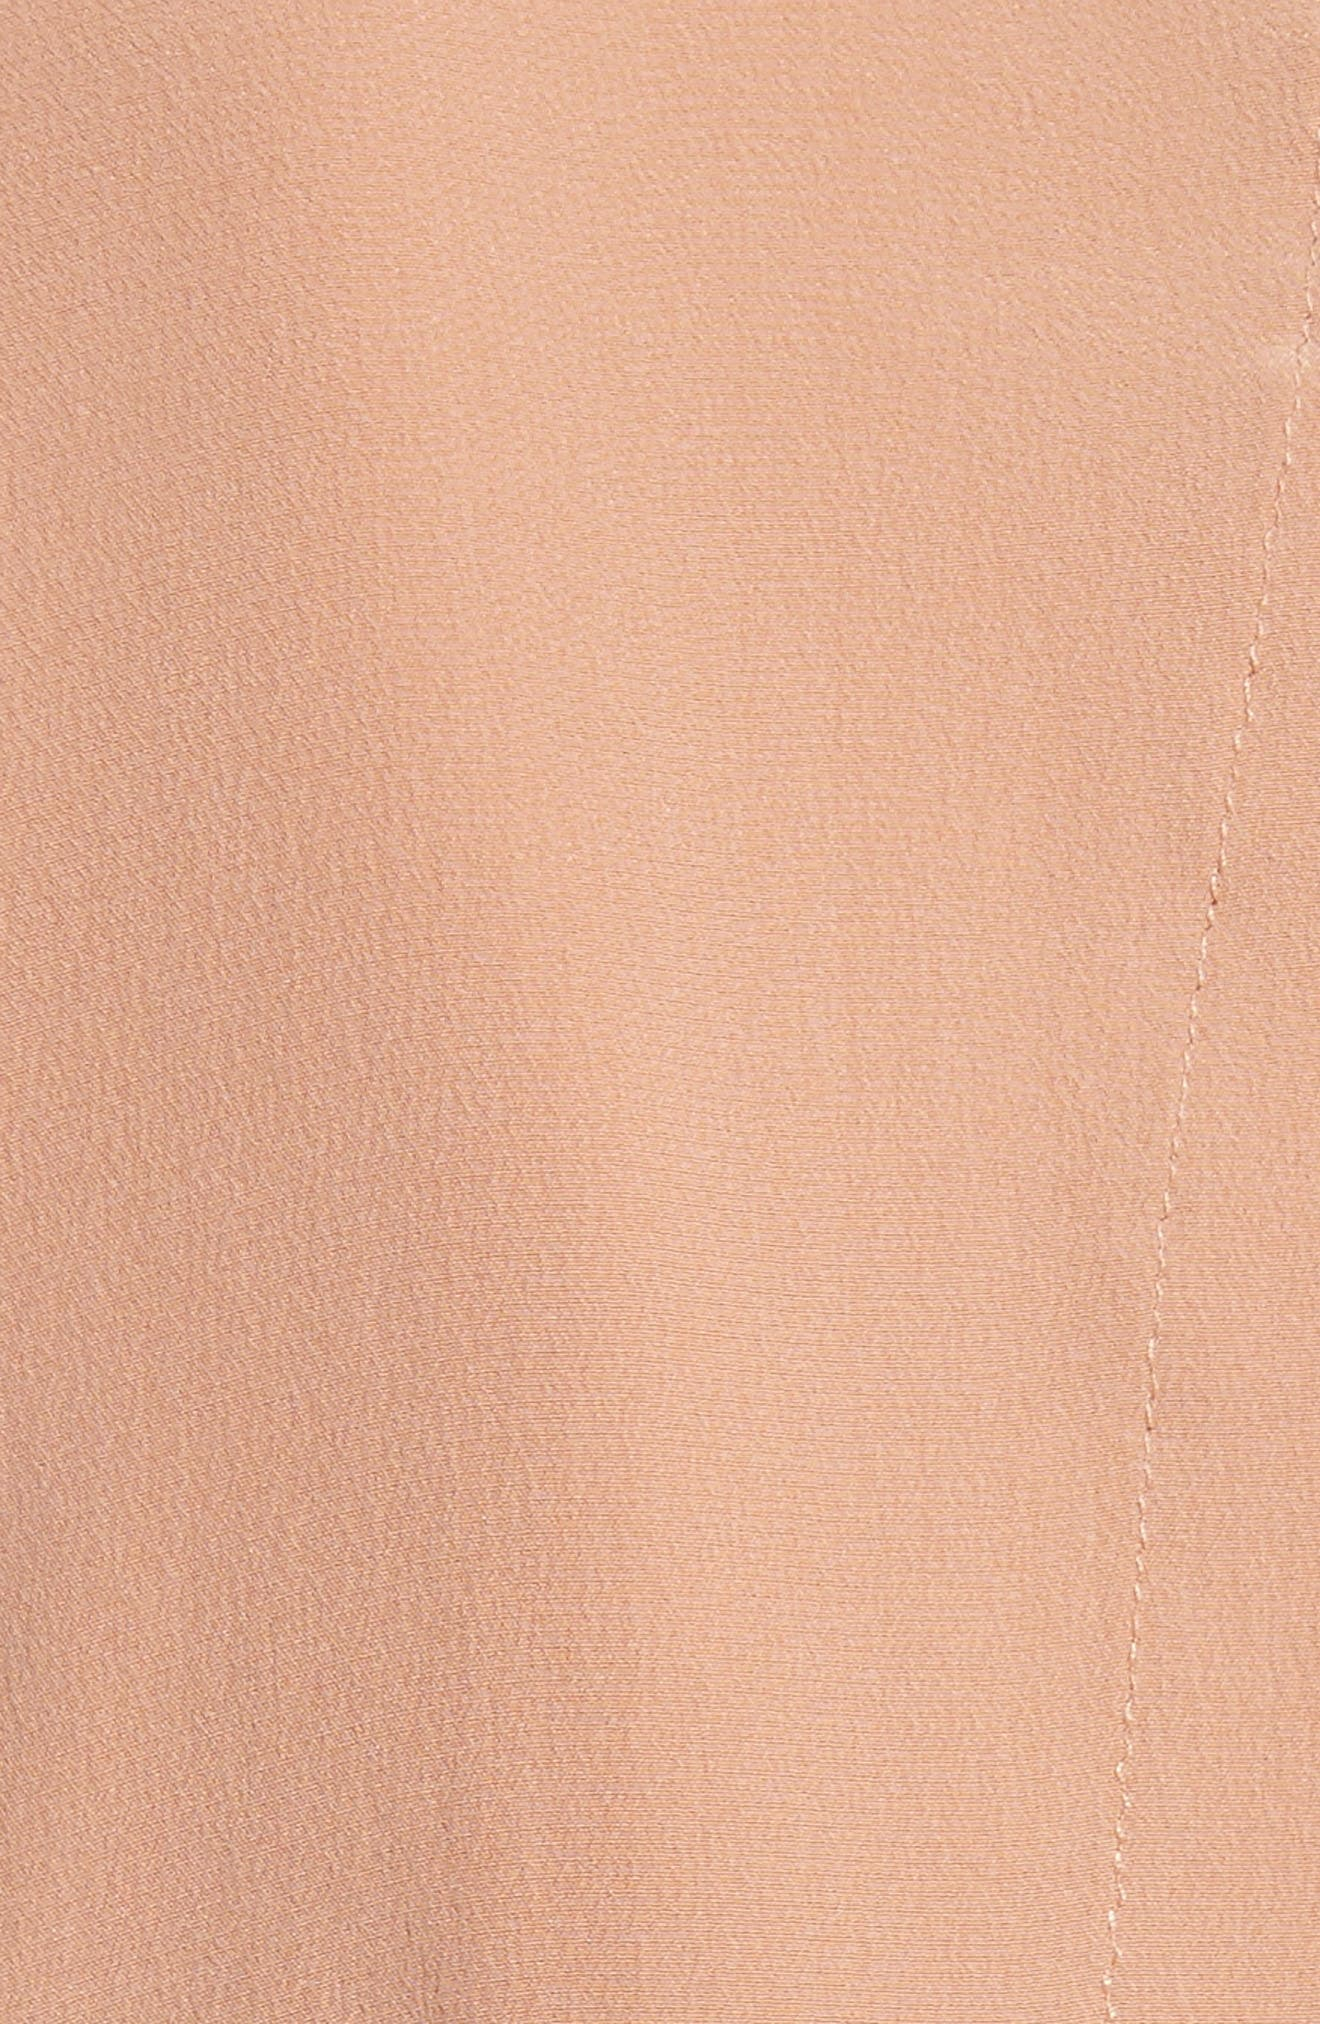 Silk Slit Back Shirtdress,                             Alternate thumbnail 6, color,                             Blush